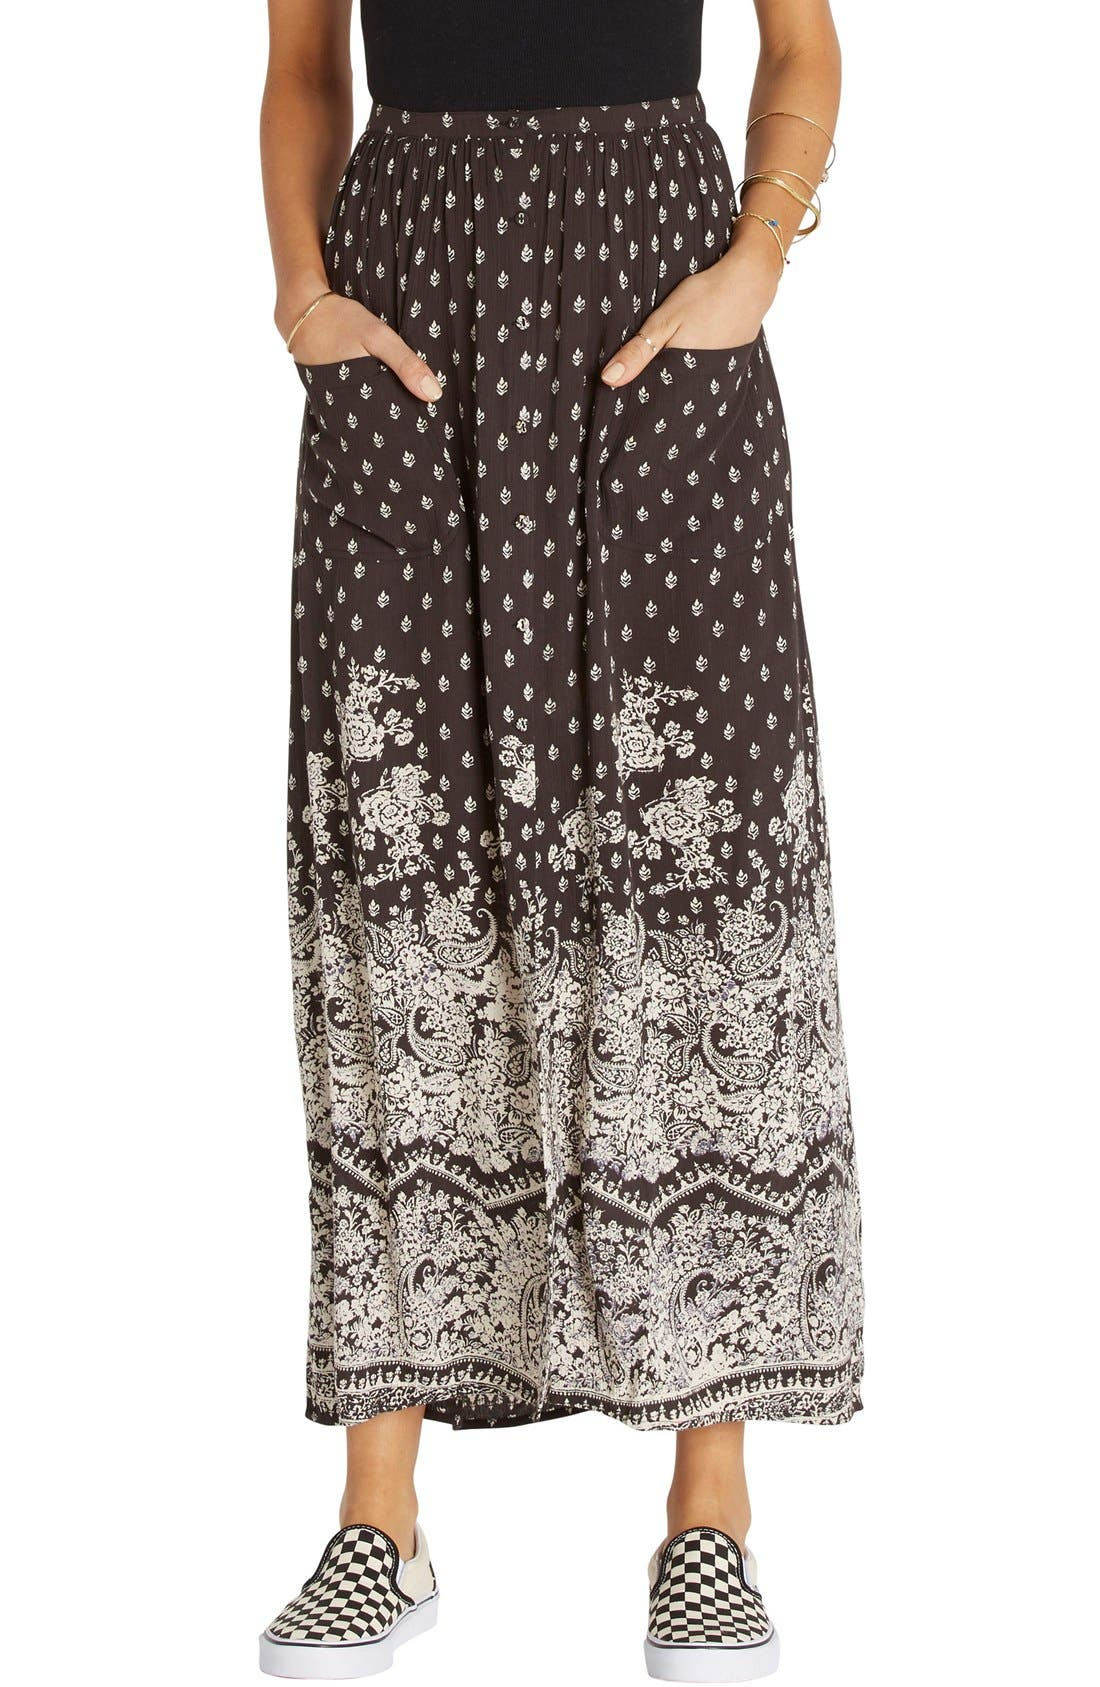 Honey High Waist Maxi Skirt,                             Main thumbnail 1, color,                             015